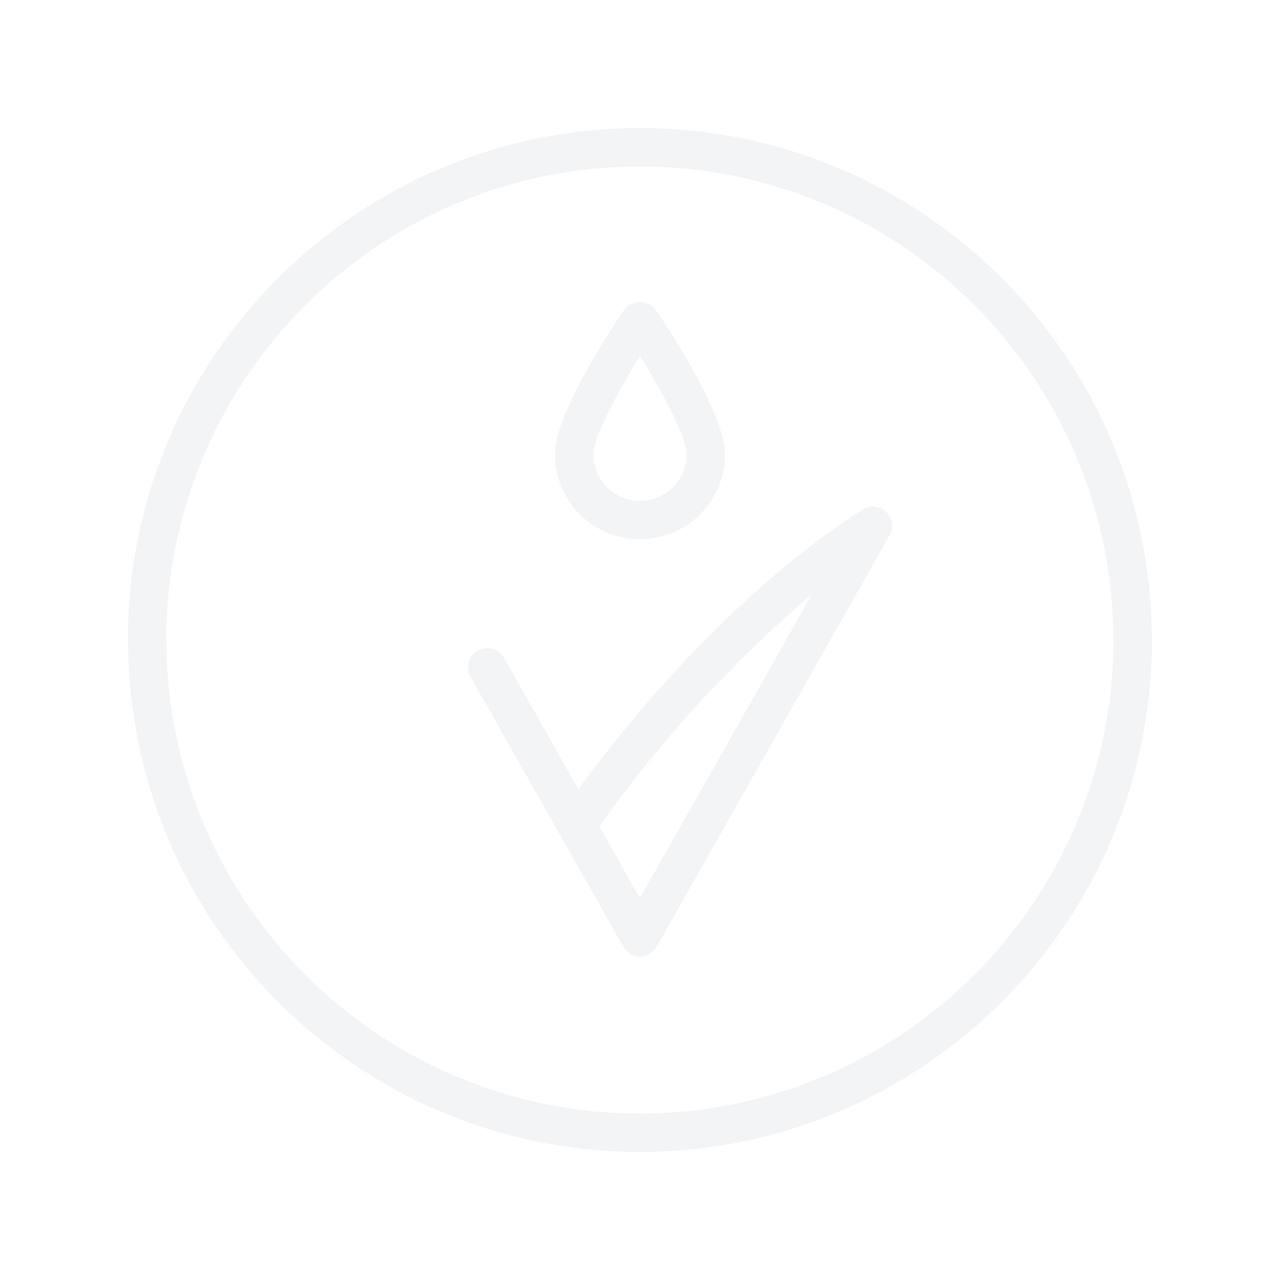 ARTDECO Mineral Powder Foundation 15g